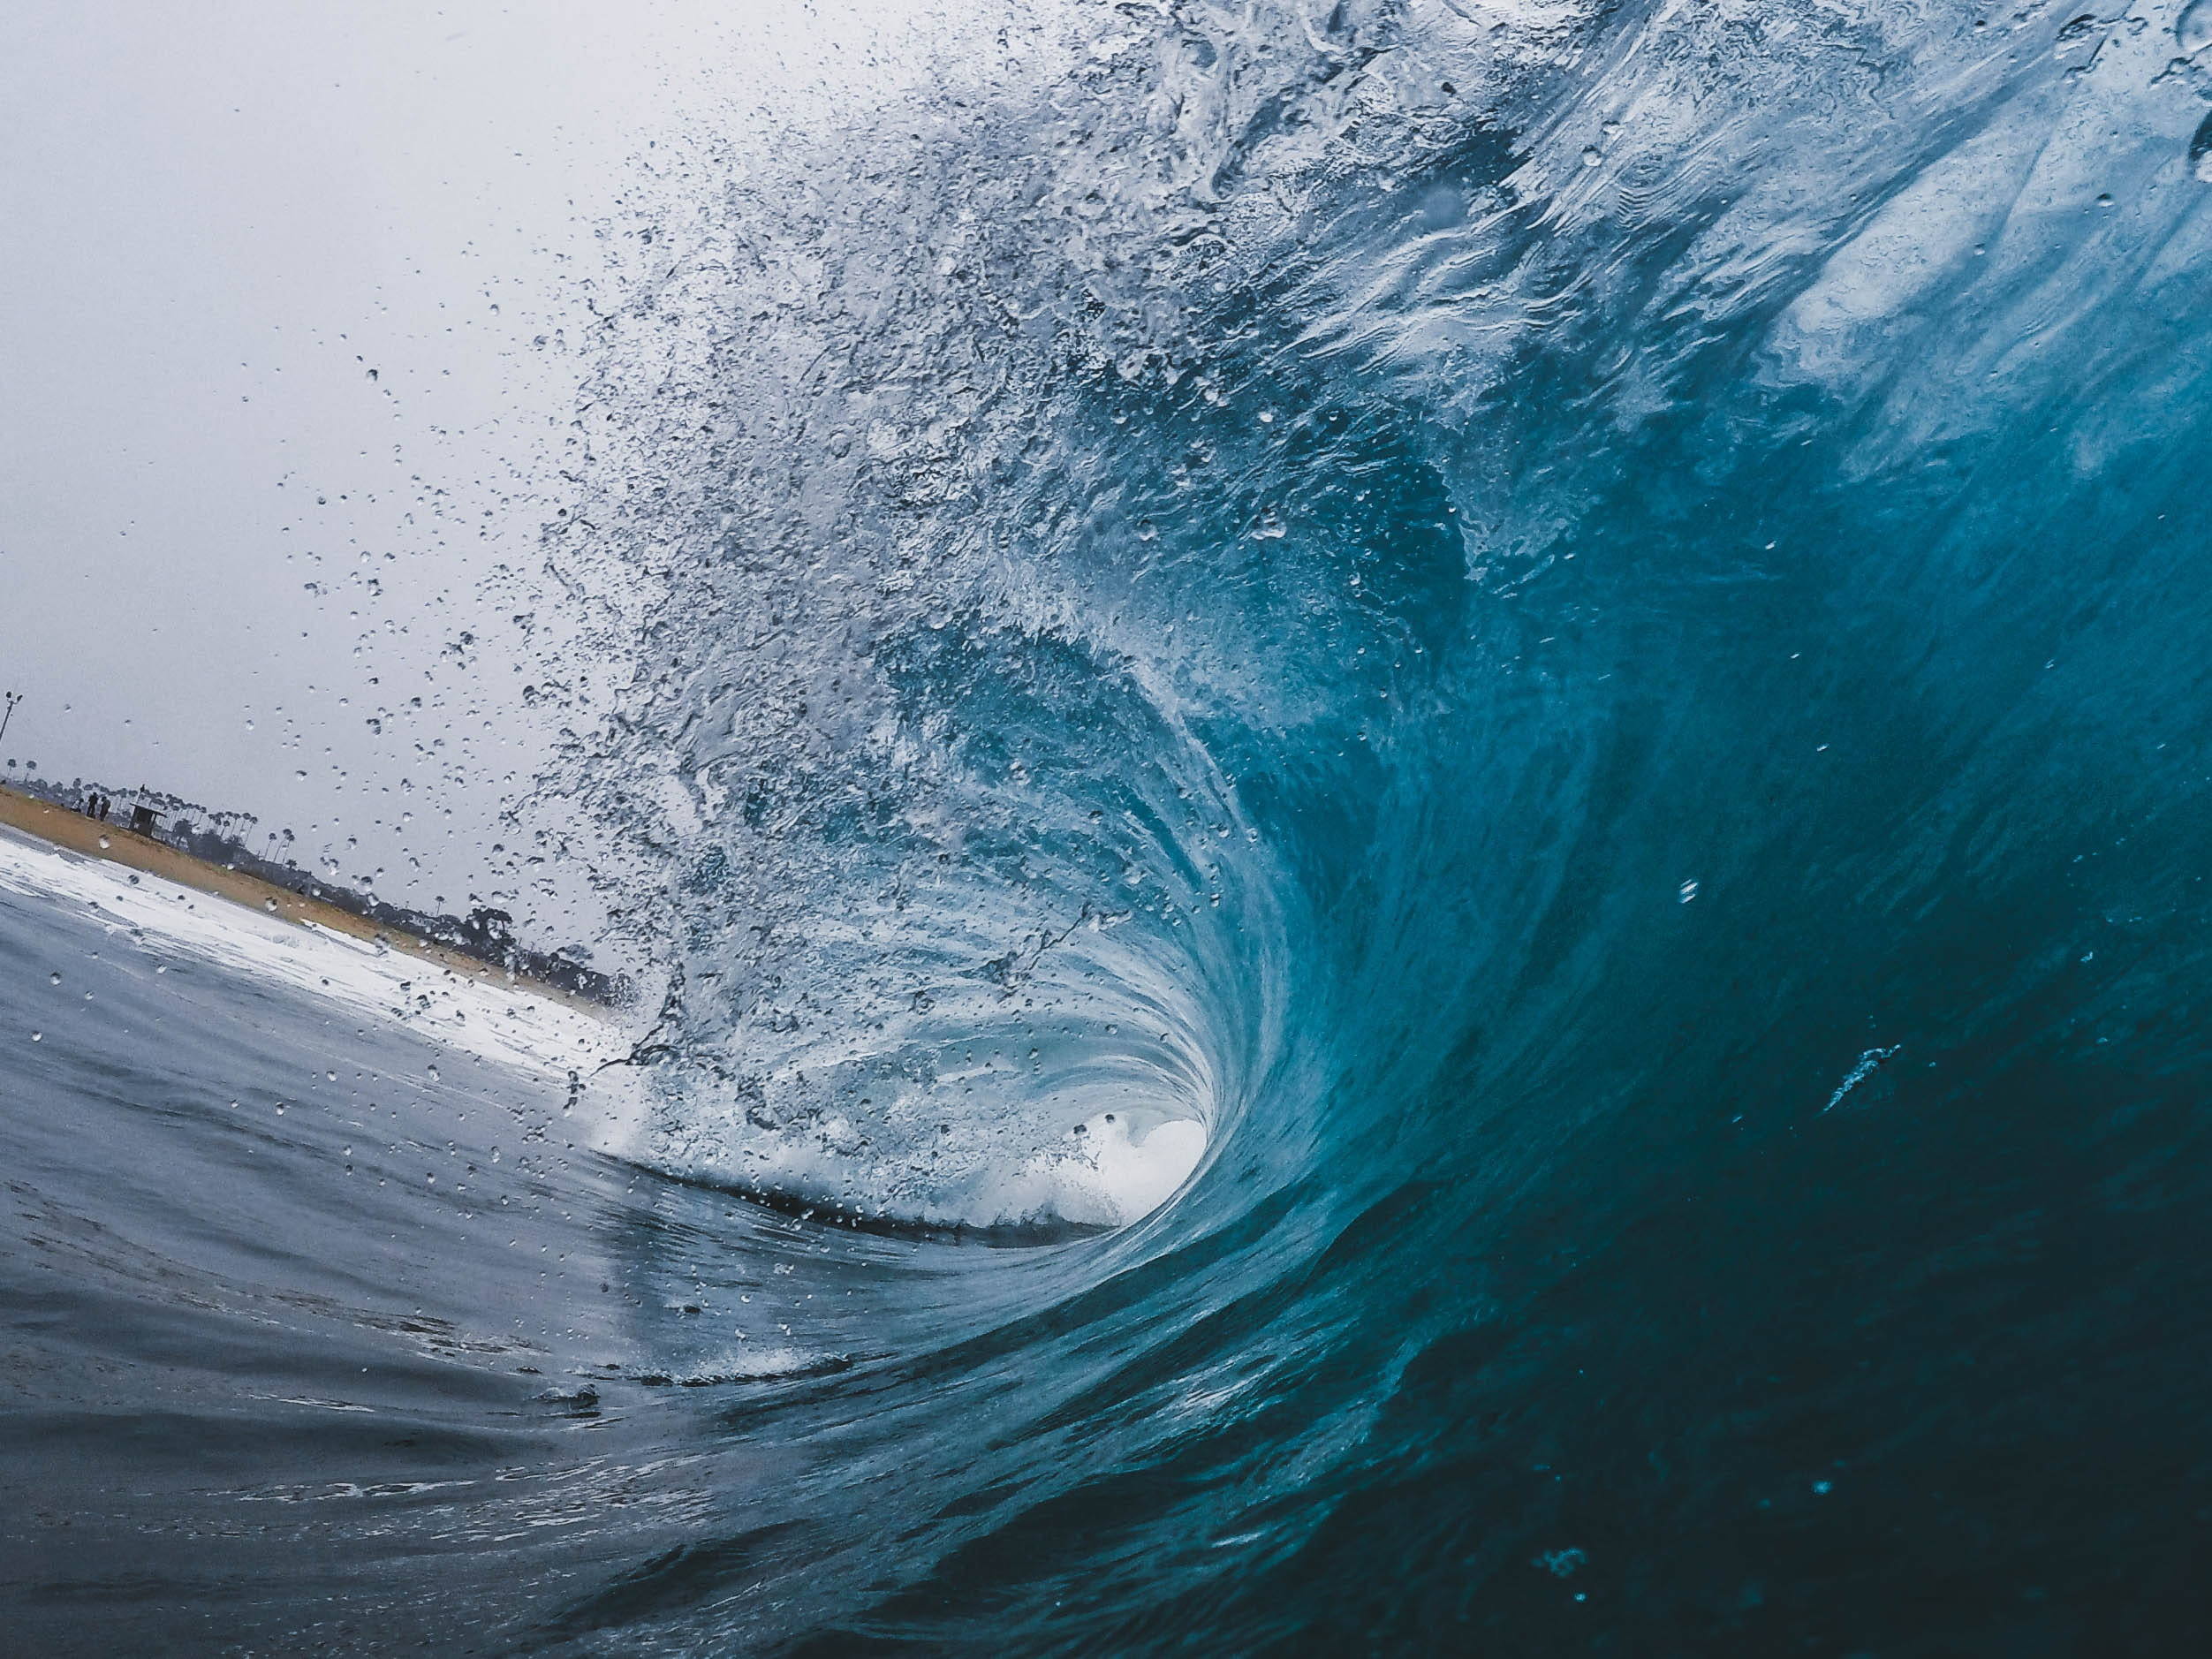 wave_mergerAdvisory